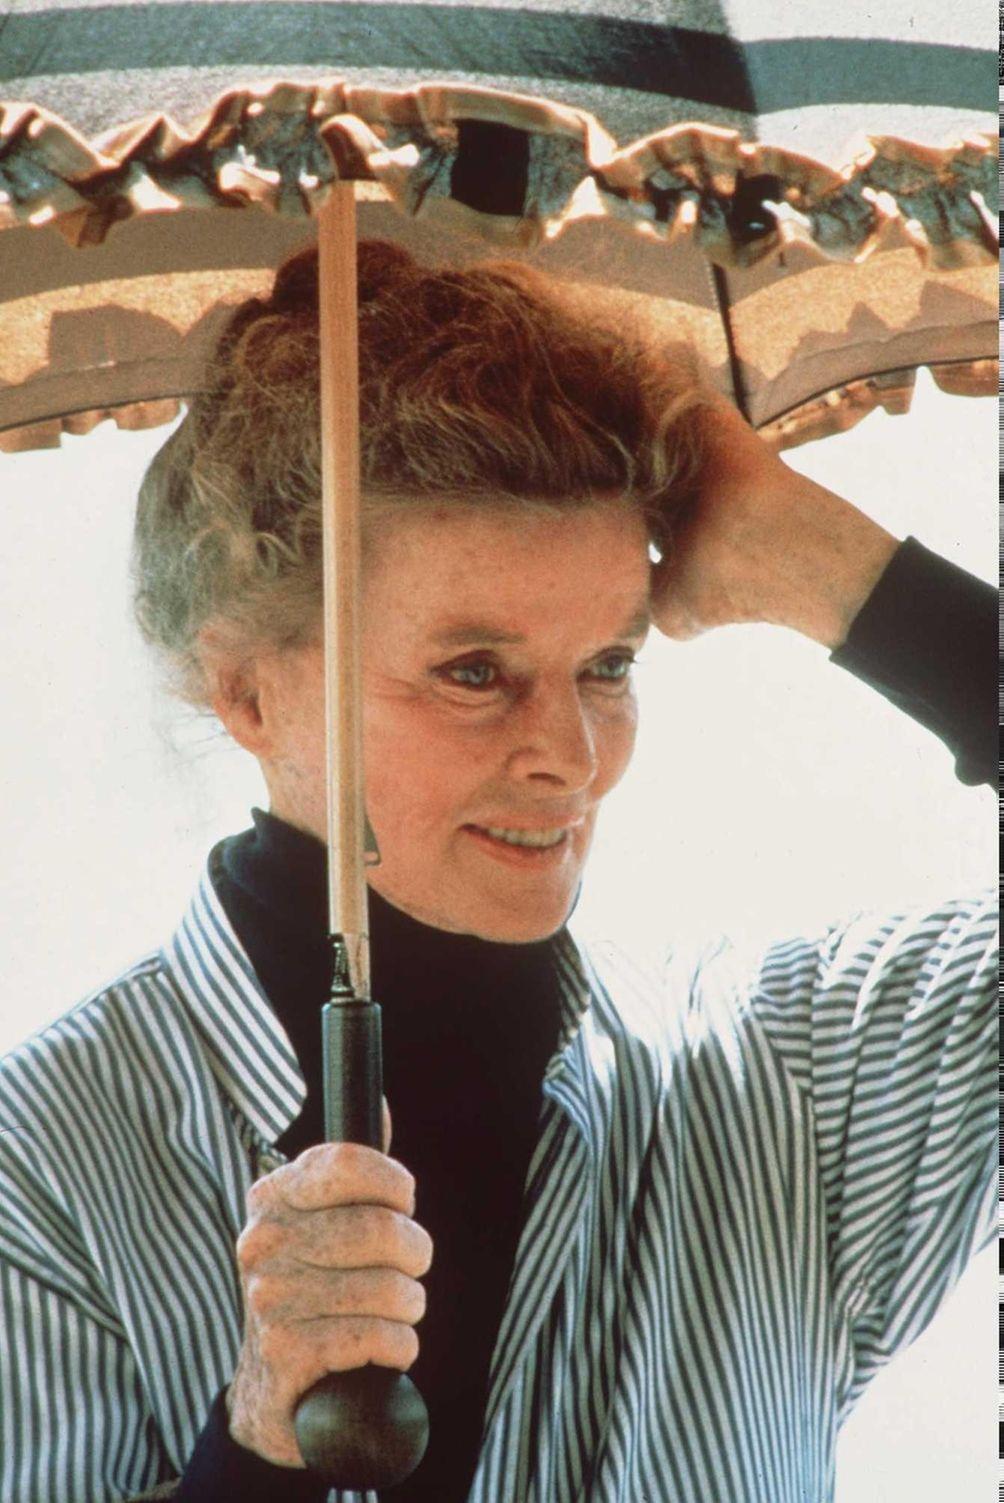 1981 - Katharine Hepburn - On Golden Pond